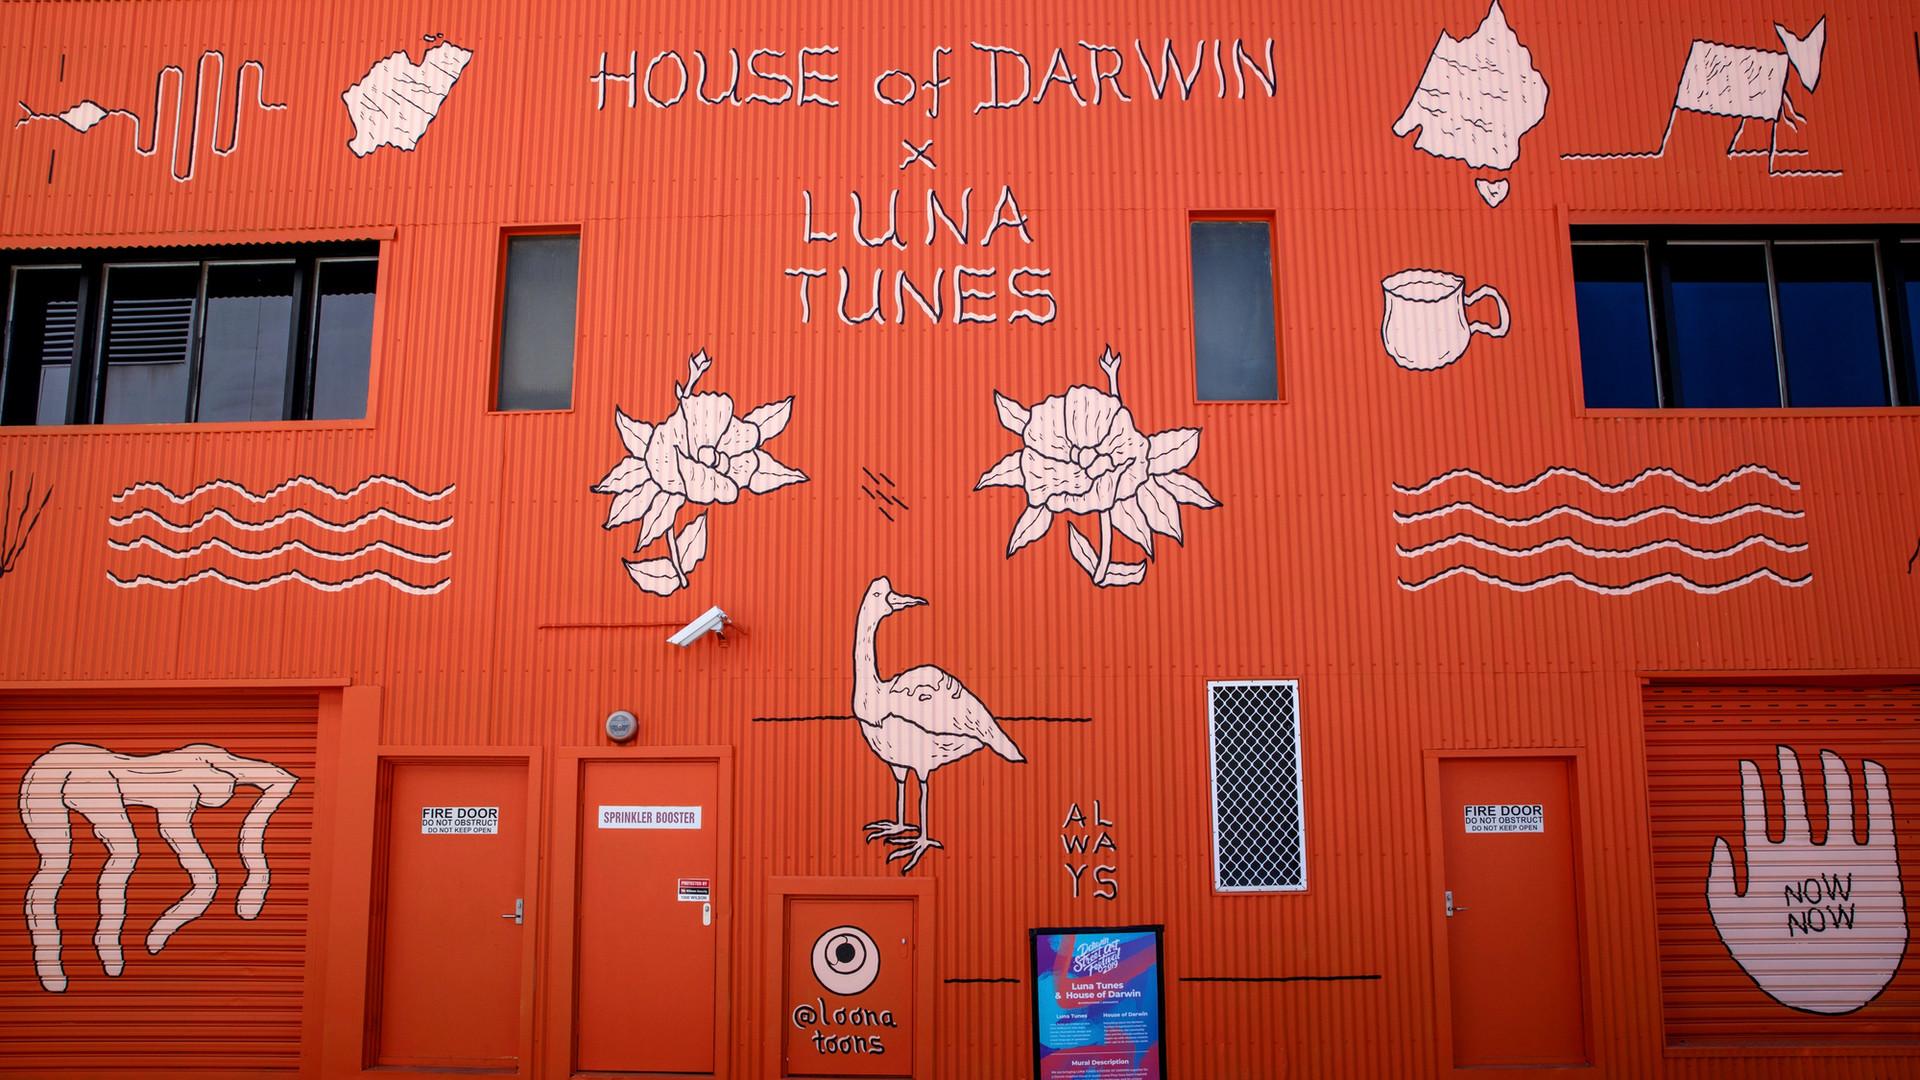 dsaf2019_lunatunes&houseofdarwin_finals-